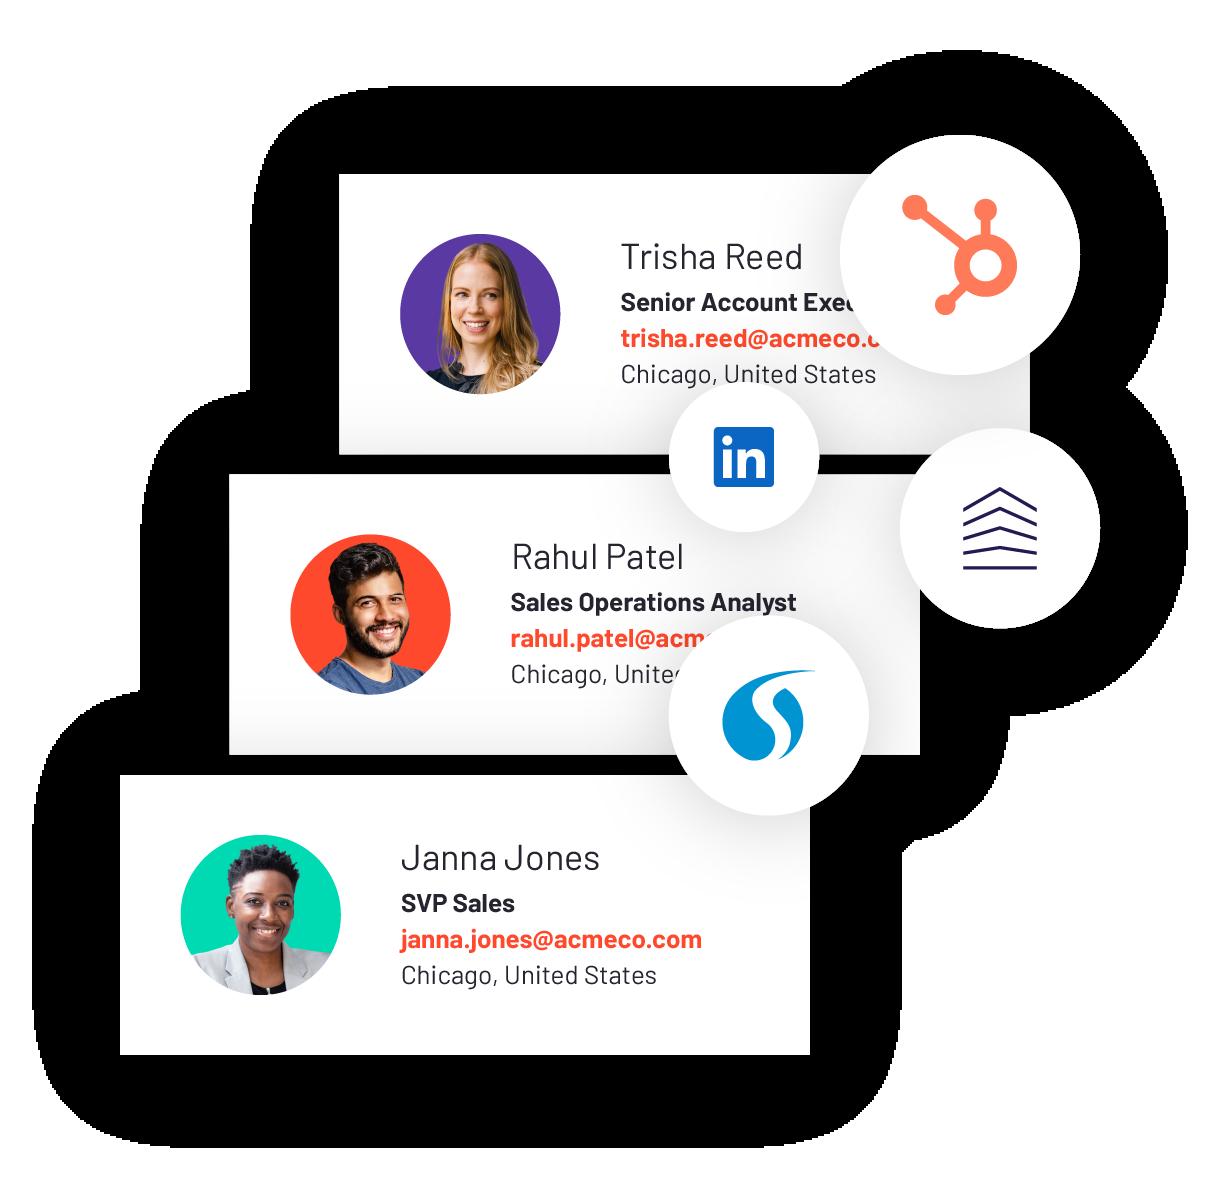 g2-integrations-for-sales-engagement-header-screenshot@2x